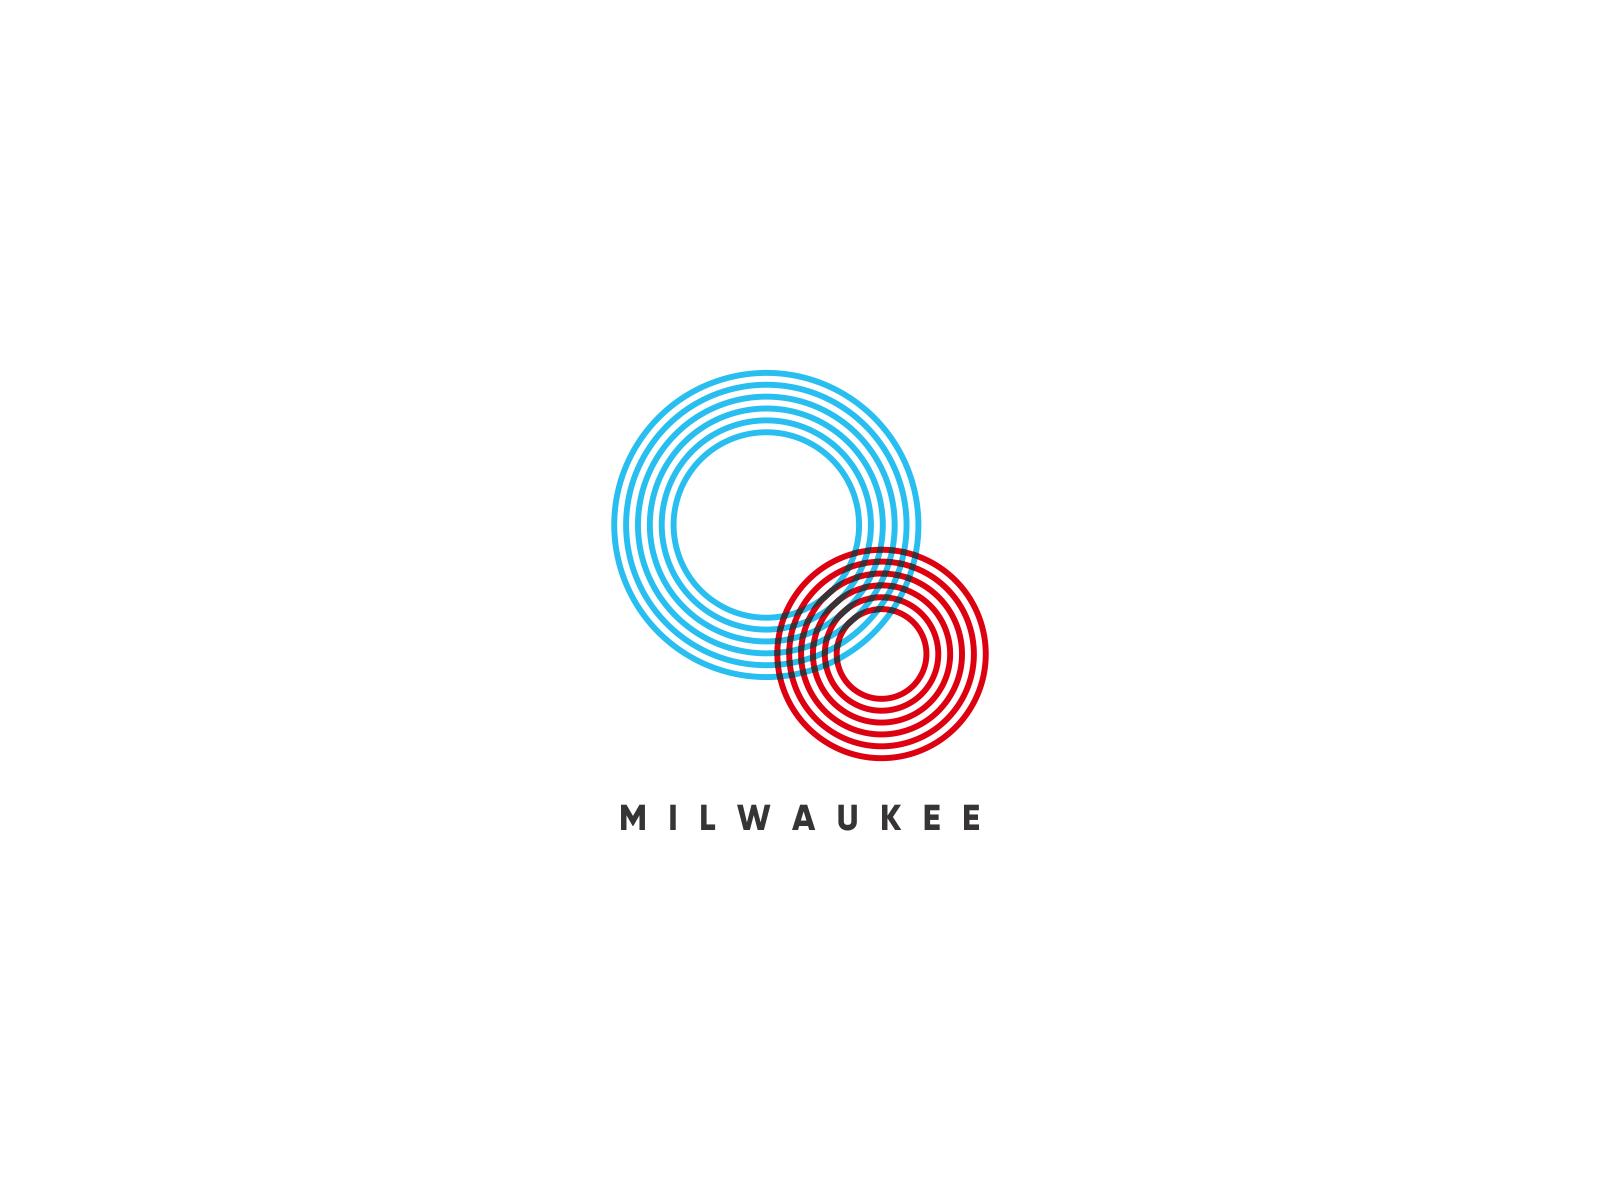 Oo Logo 00 0 overlapping lines thin circles circular line design branding unused throwback blue red retro logomark mark logo oo o